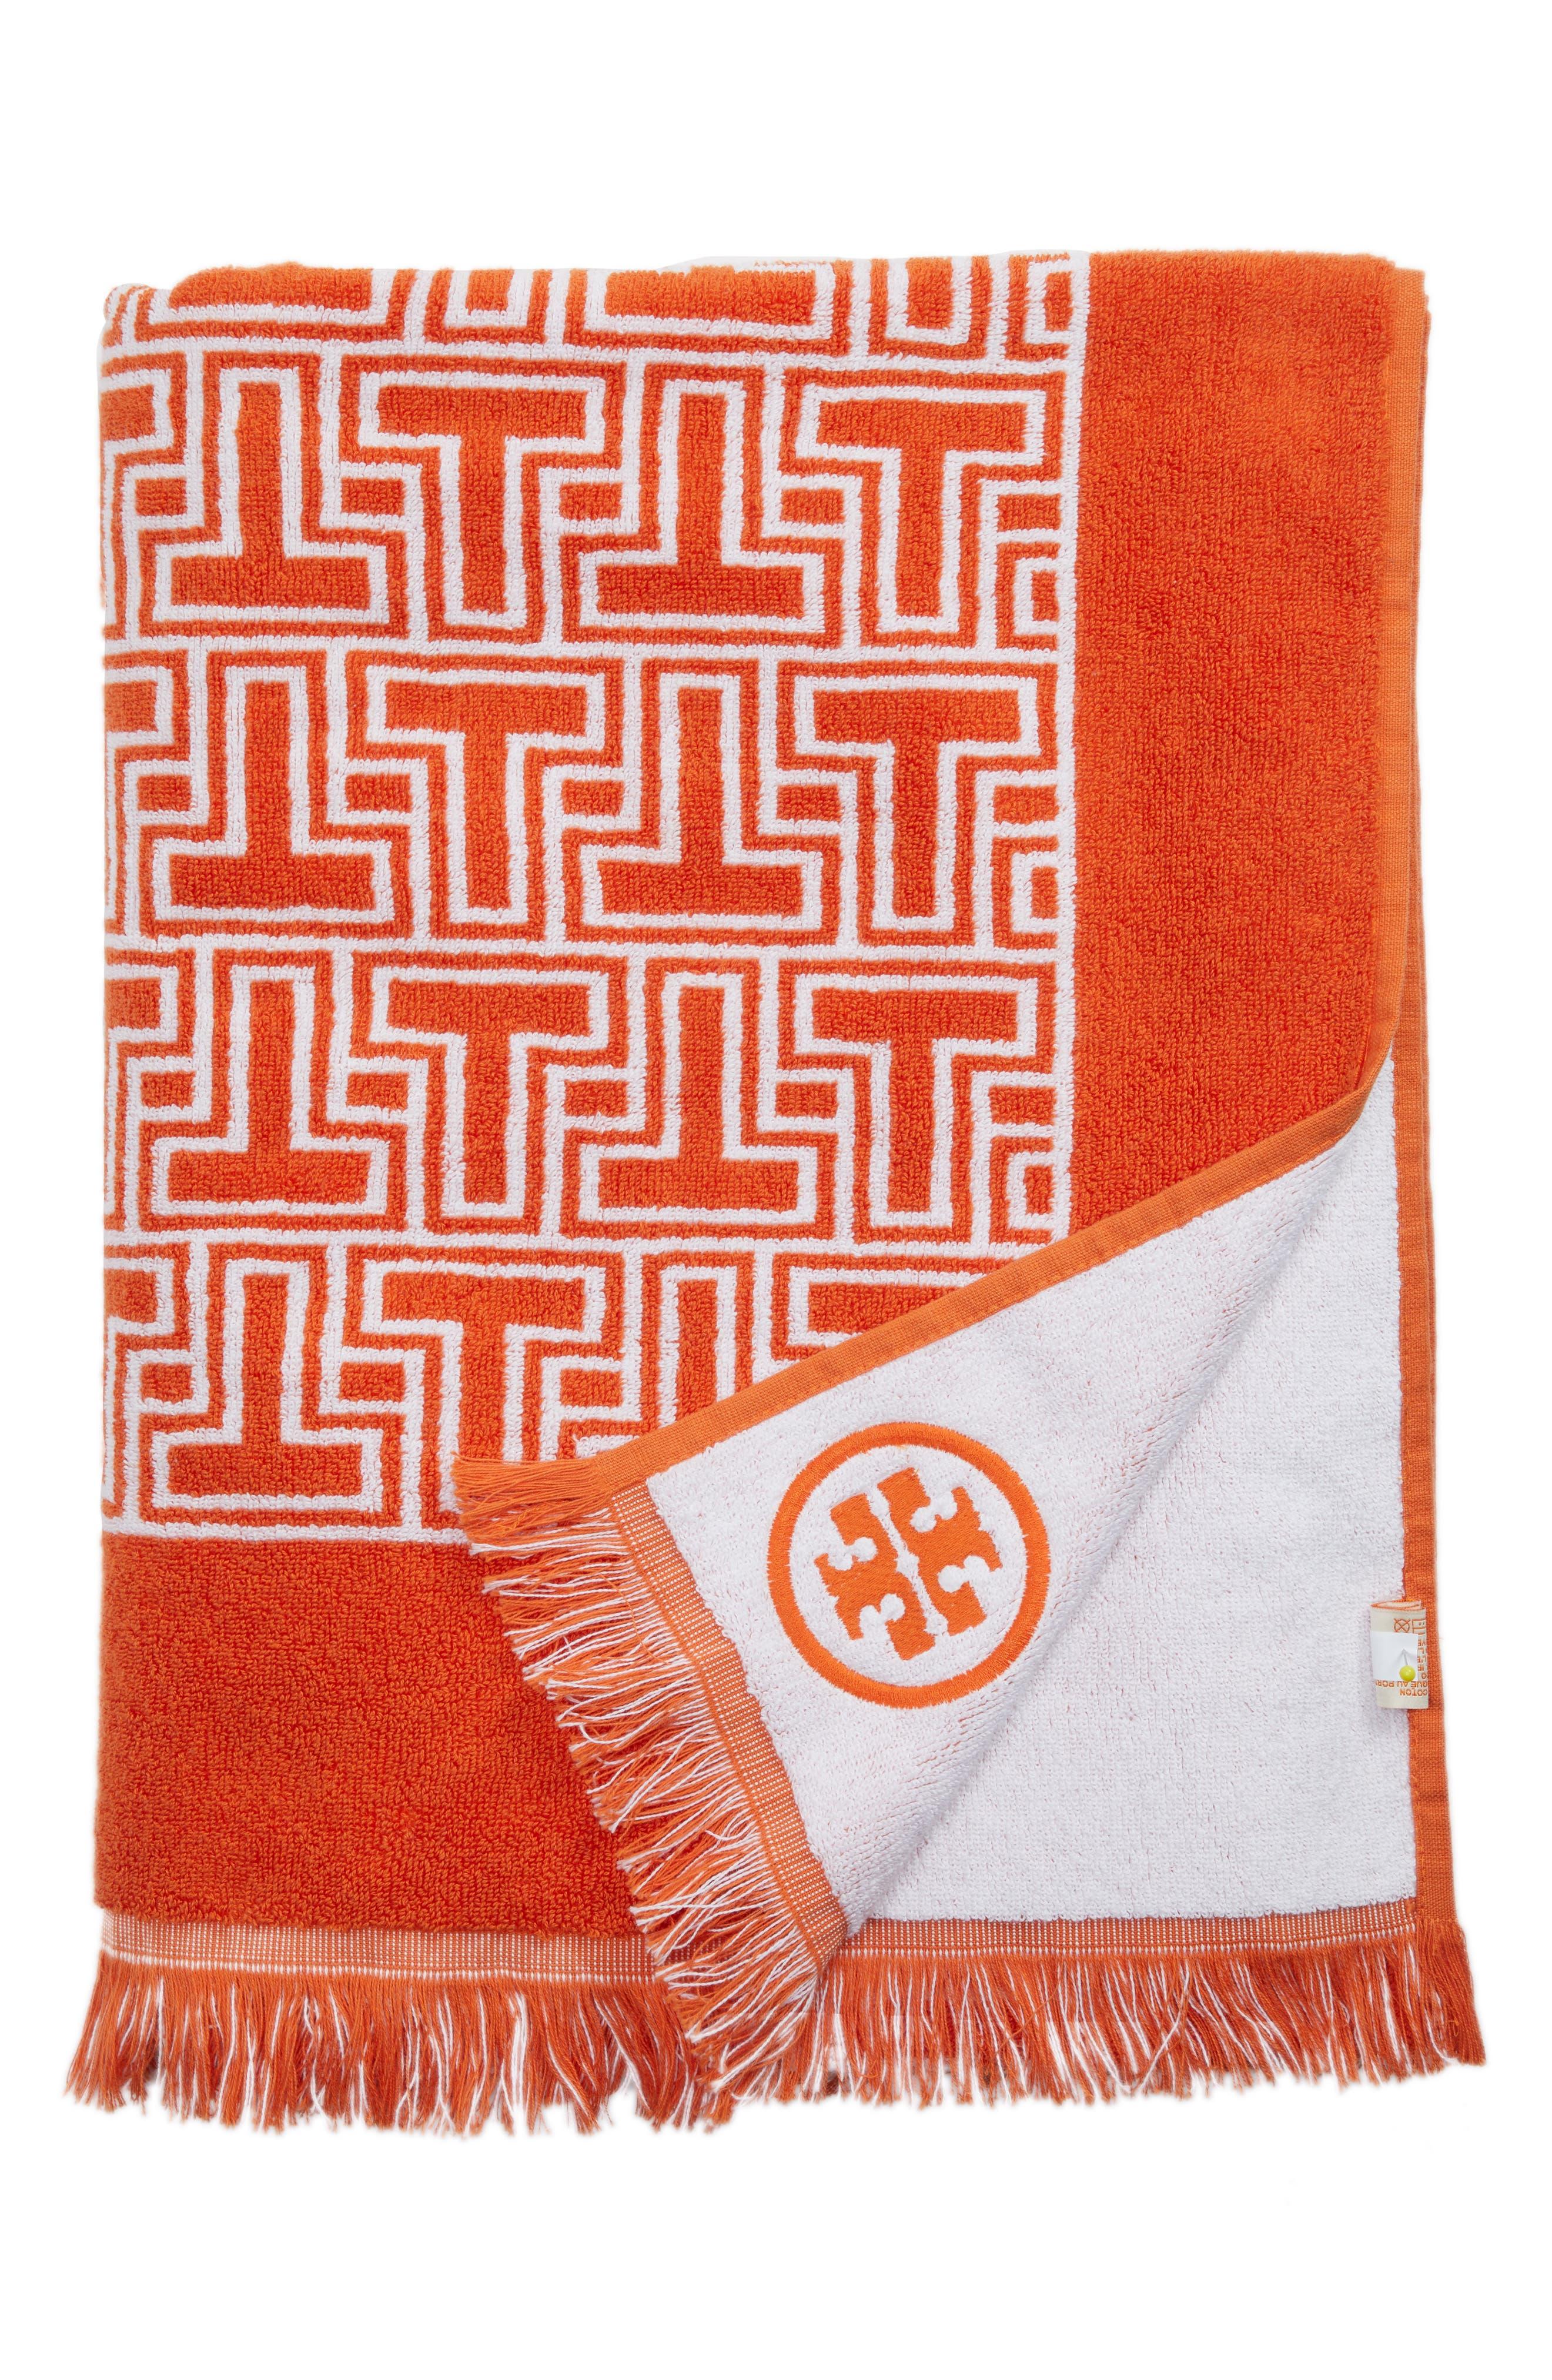 T-Tiles Beach Towel,                             Main thumbnail 1, color,                             ORANGE